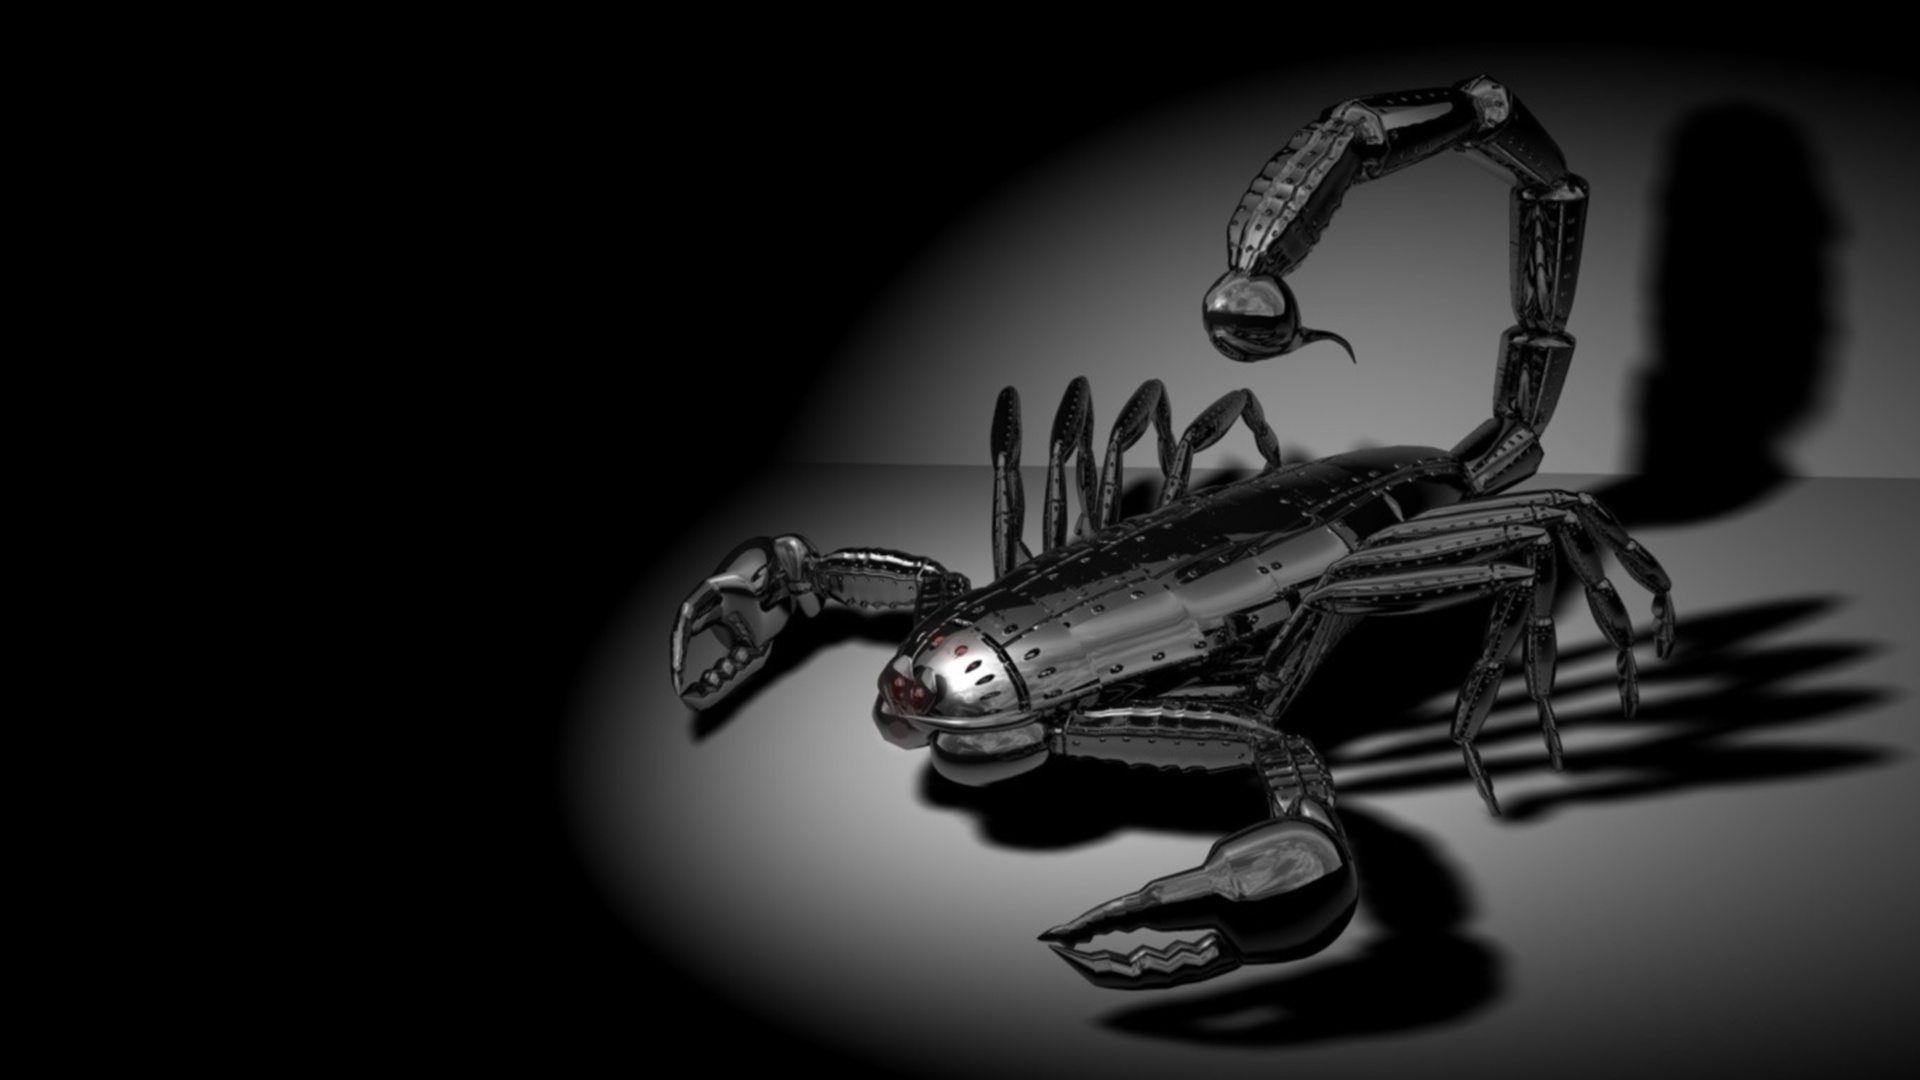 Black Scorpion HD Wallpaper From Gallsource